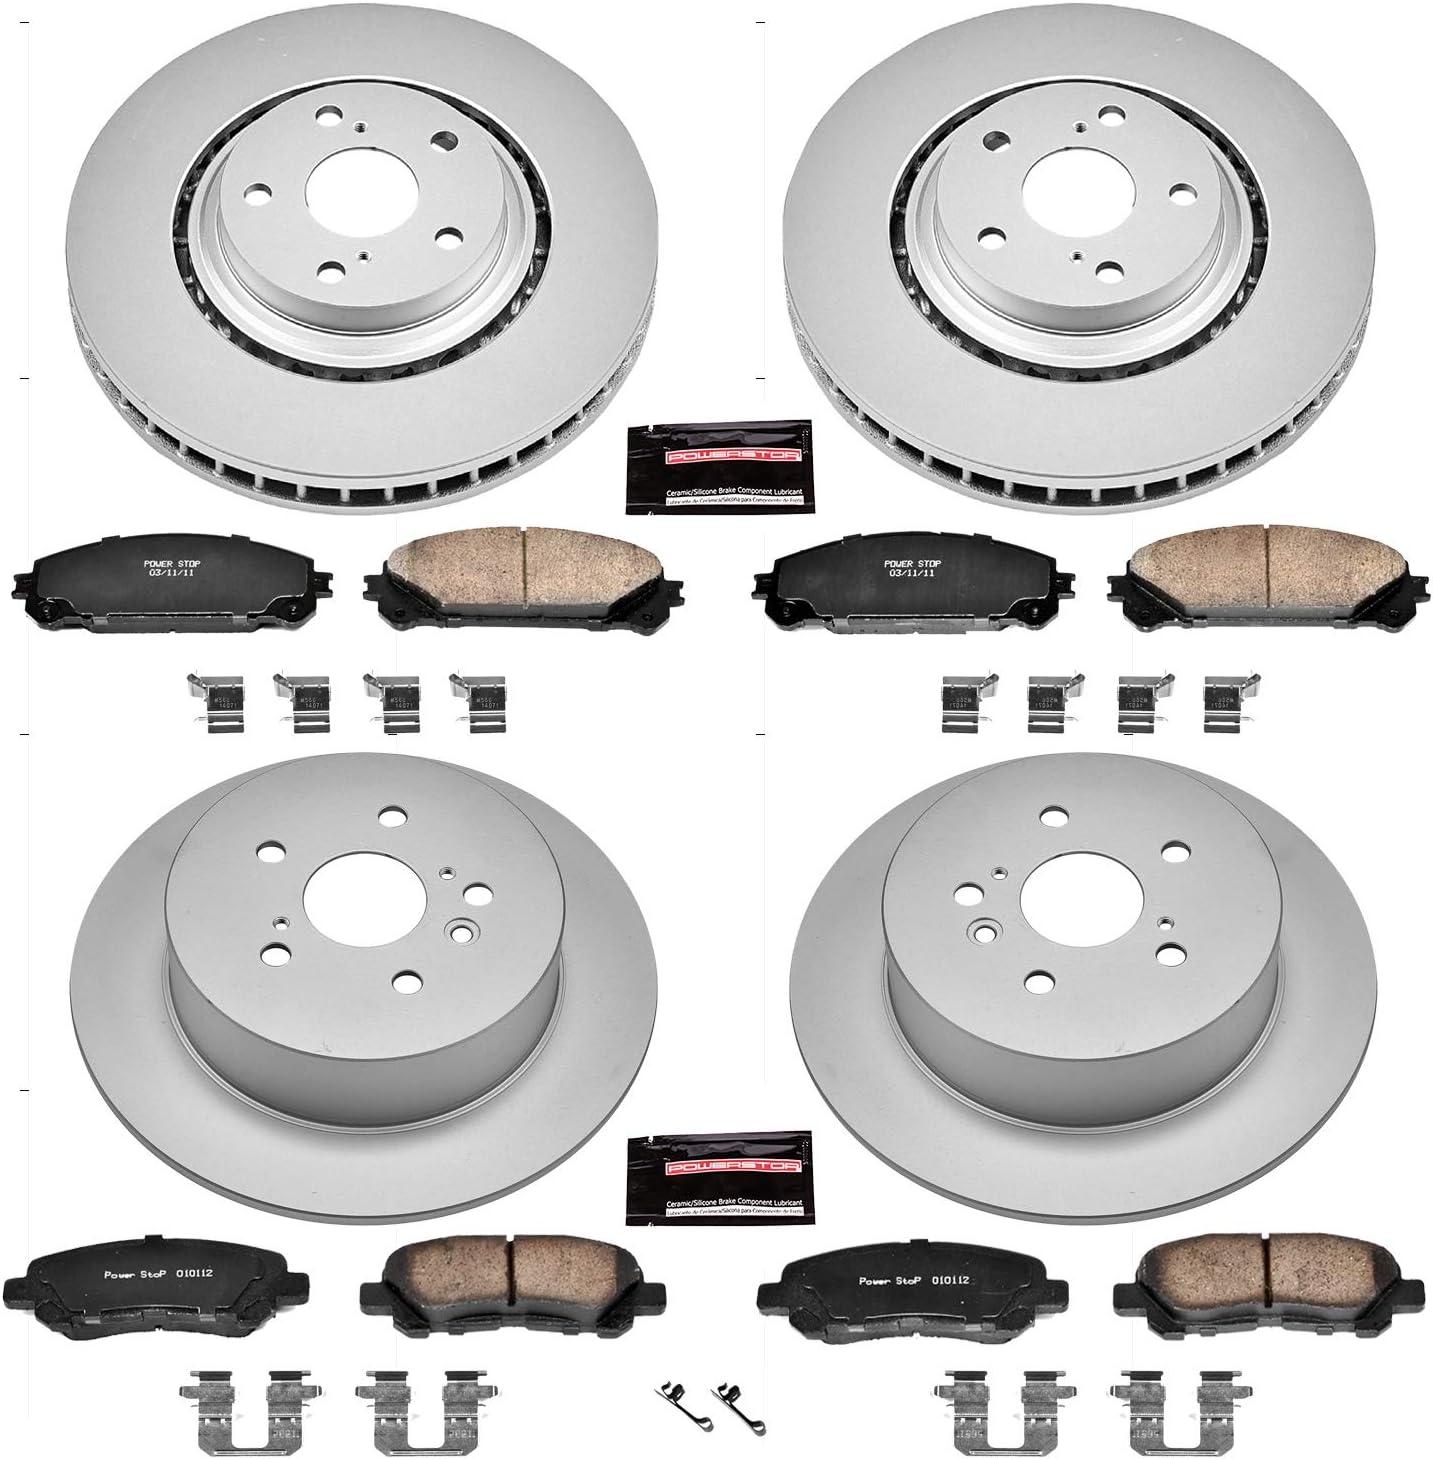 Power Stop CRK1990,Z17 Front Coated Rotor Kit-Coated Brake Rotors /& Ceramic Brake Pads